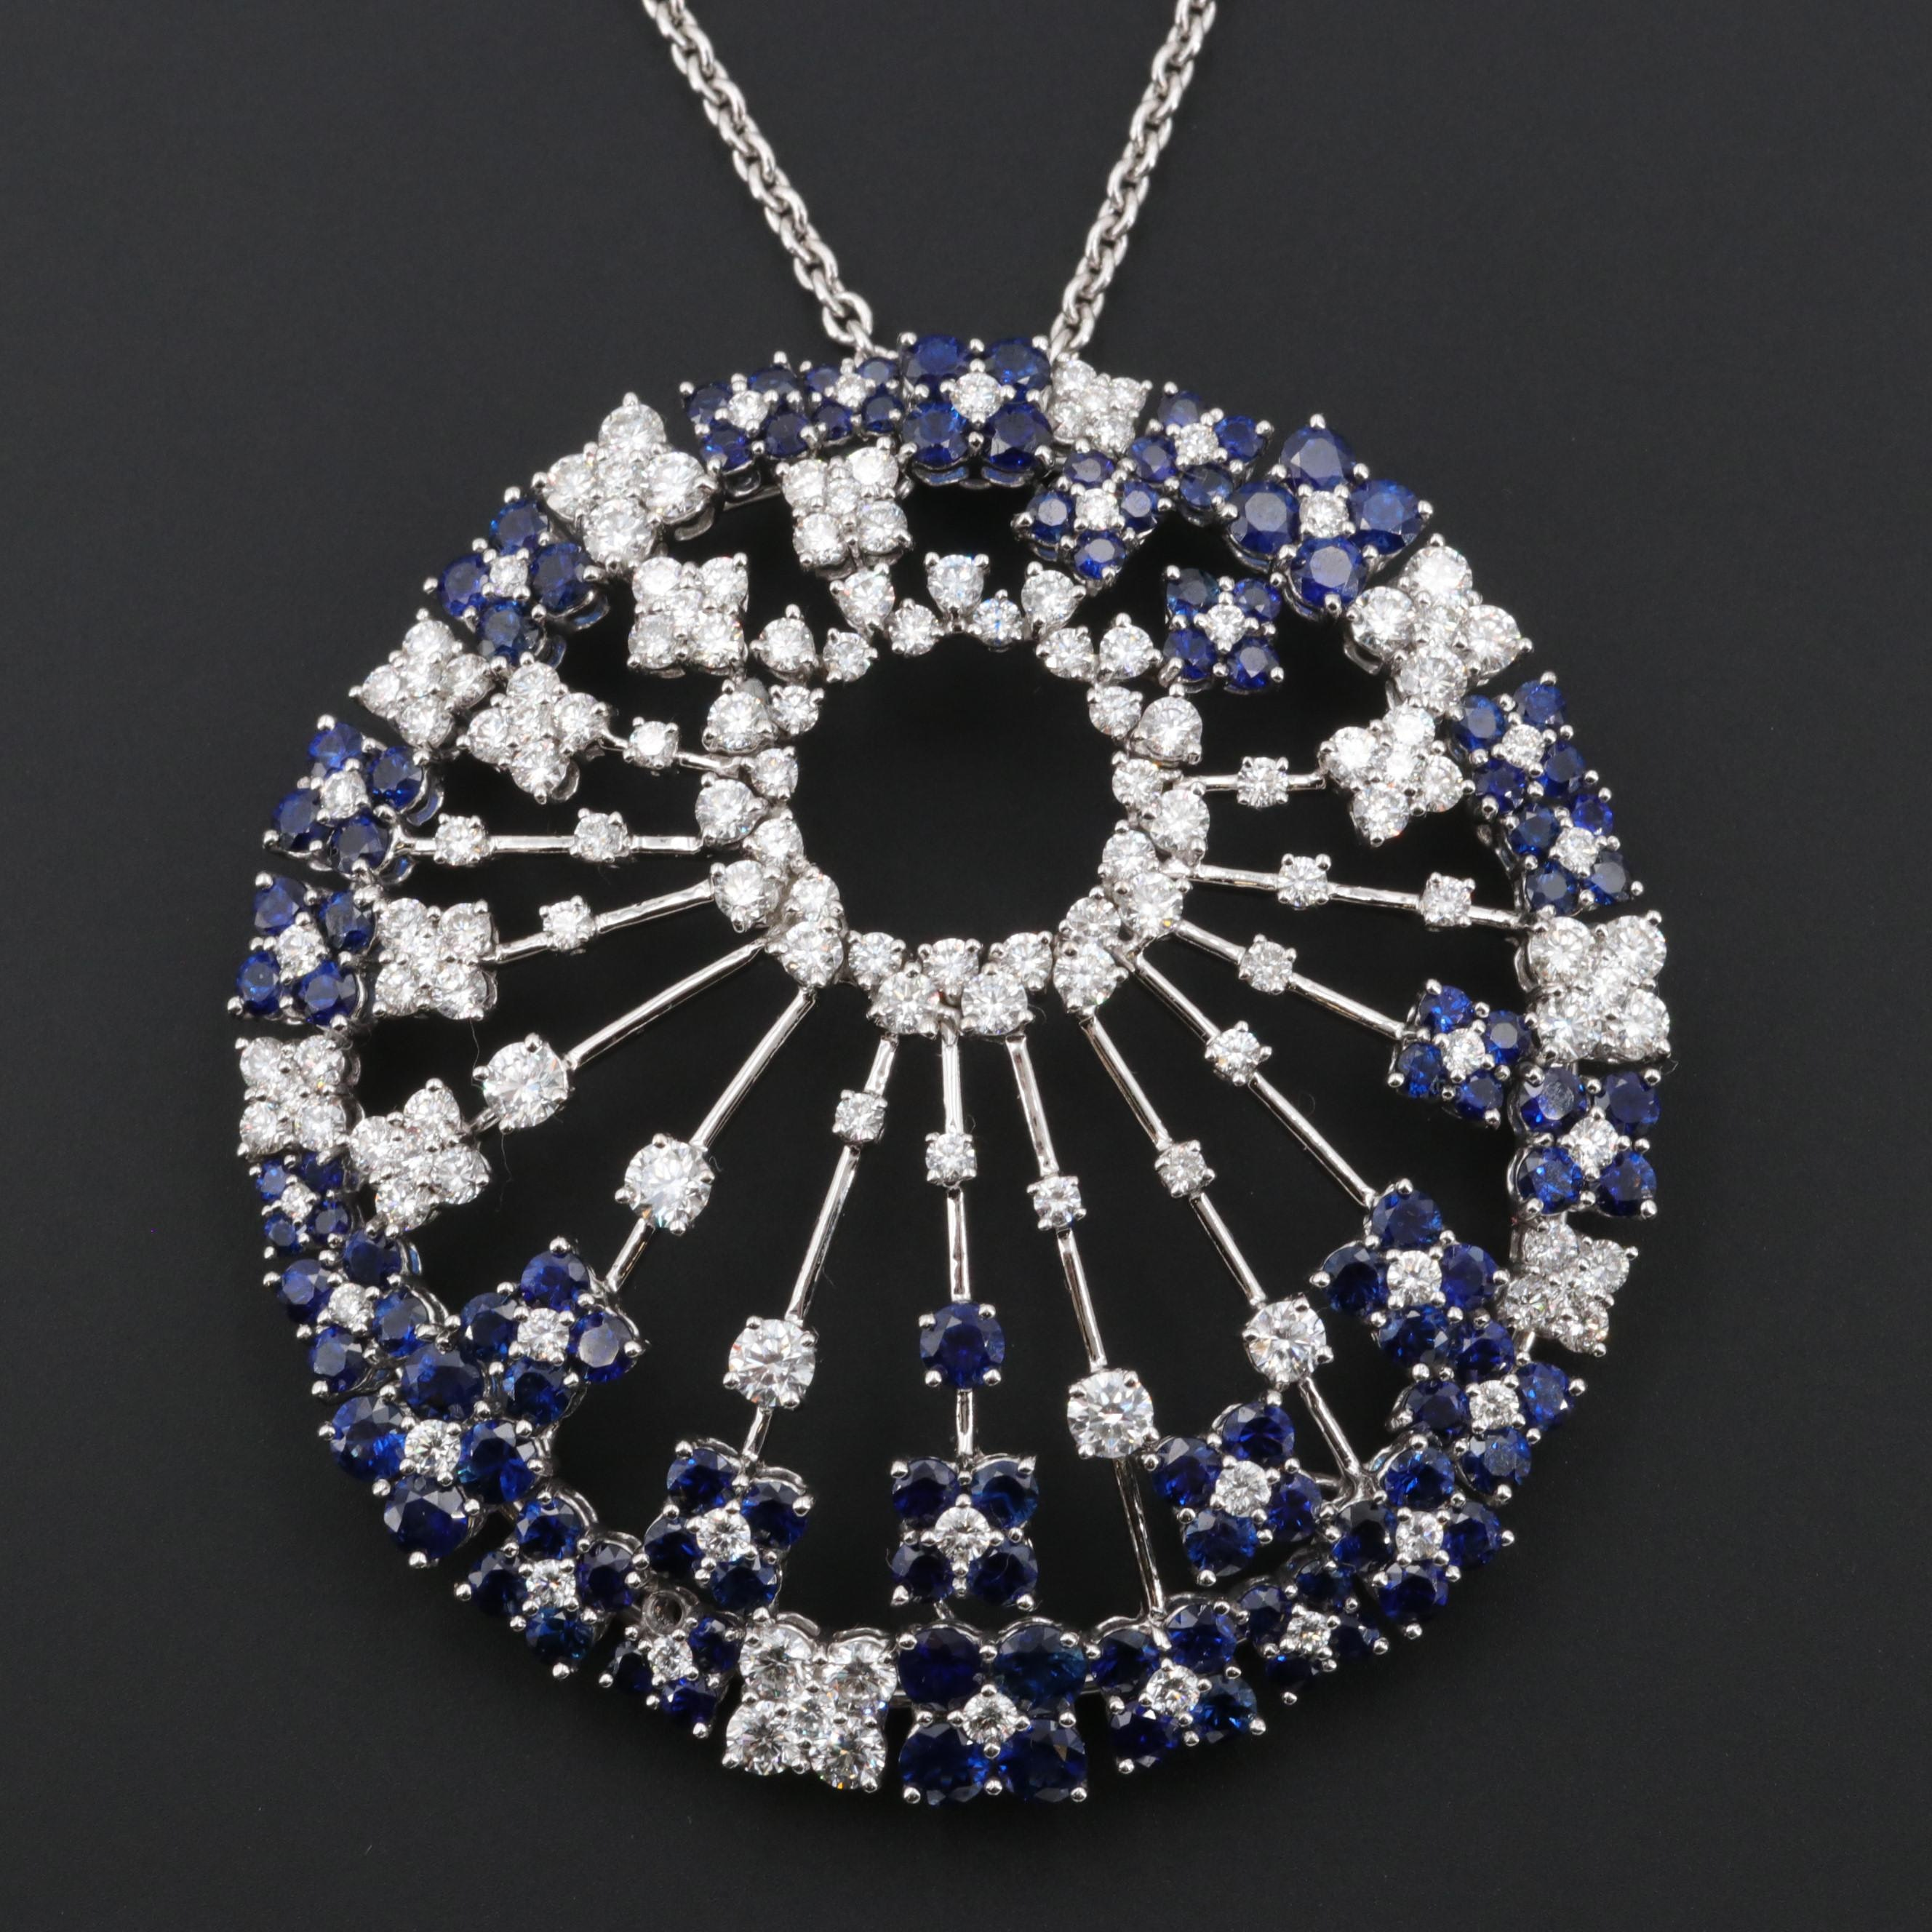 18K White Gold 4.77 CTW Diamond and 7.16 CTW Blue Sapphire Pendant Necklace